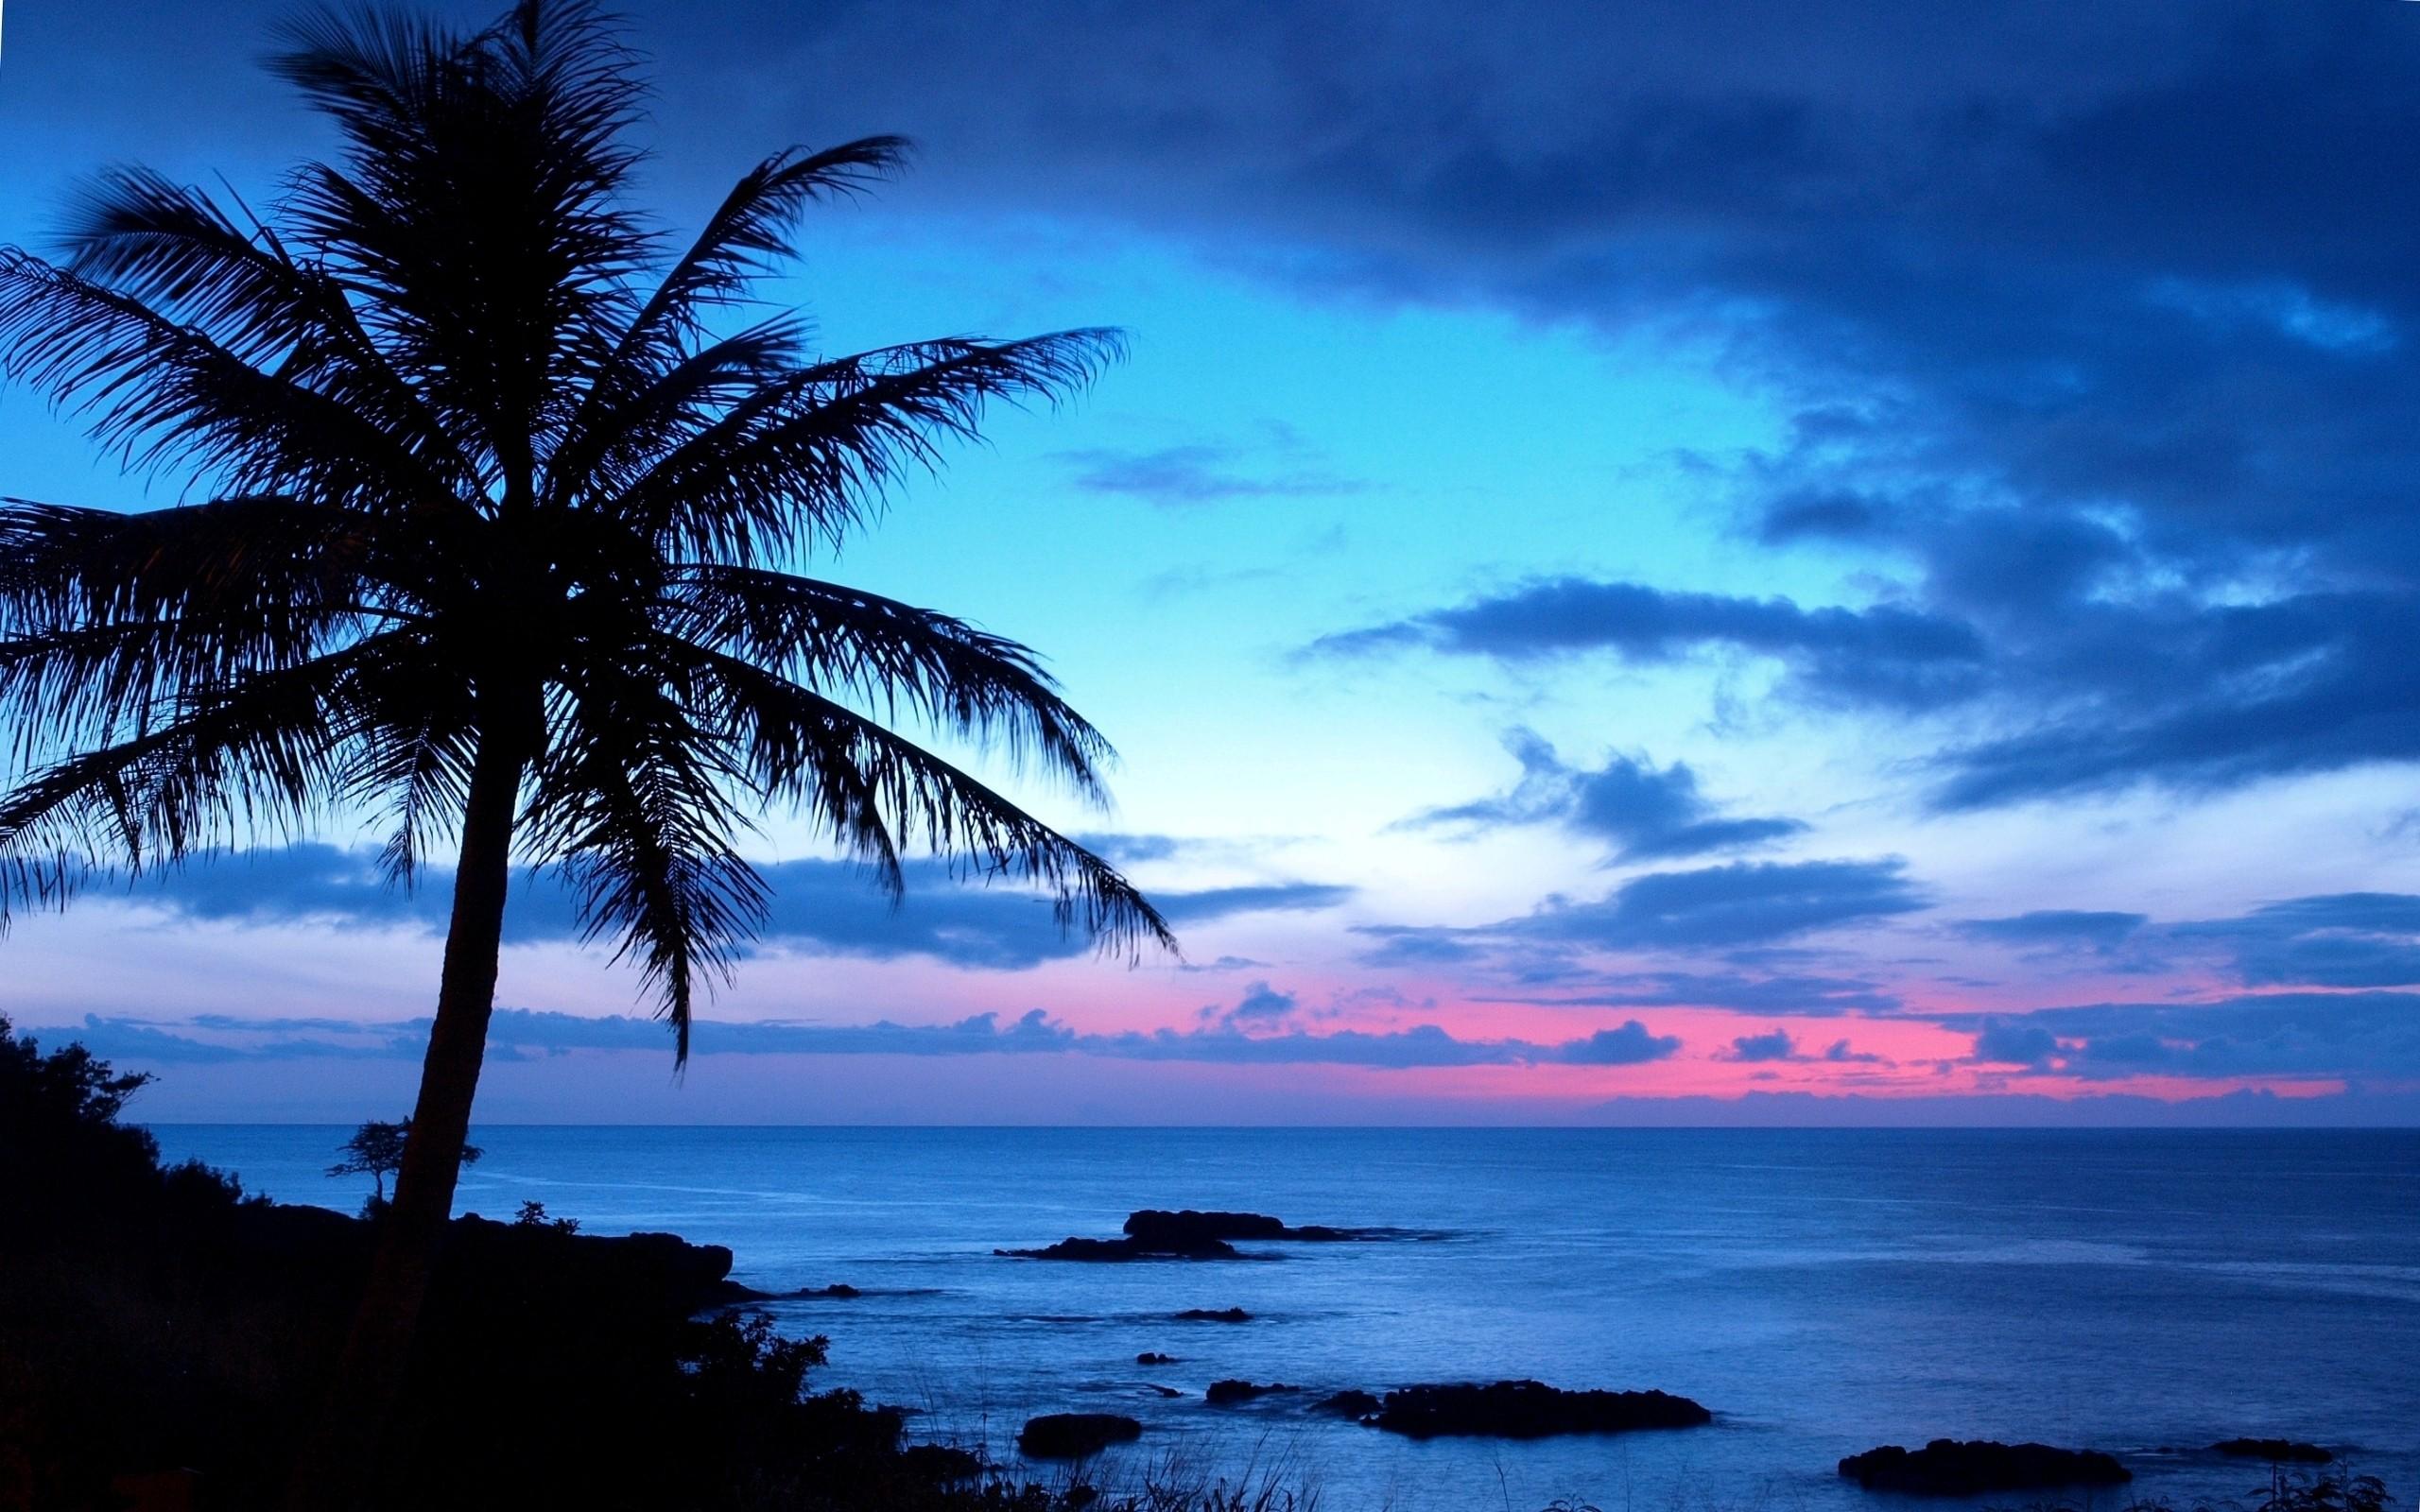 hawaii wallpaper download free wallpapers for desktop mobile